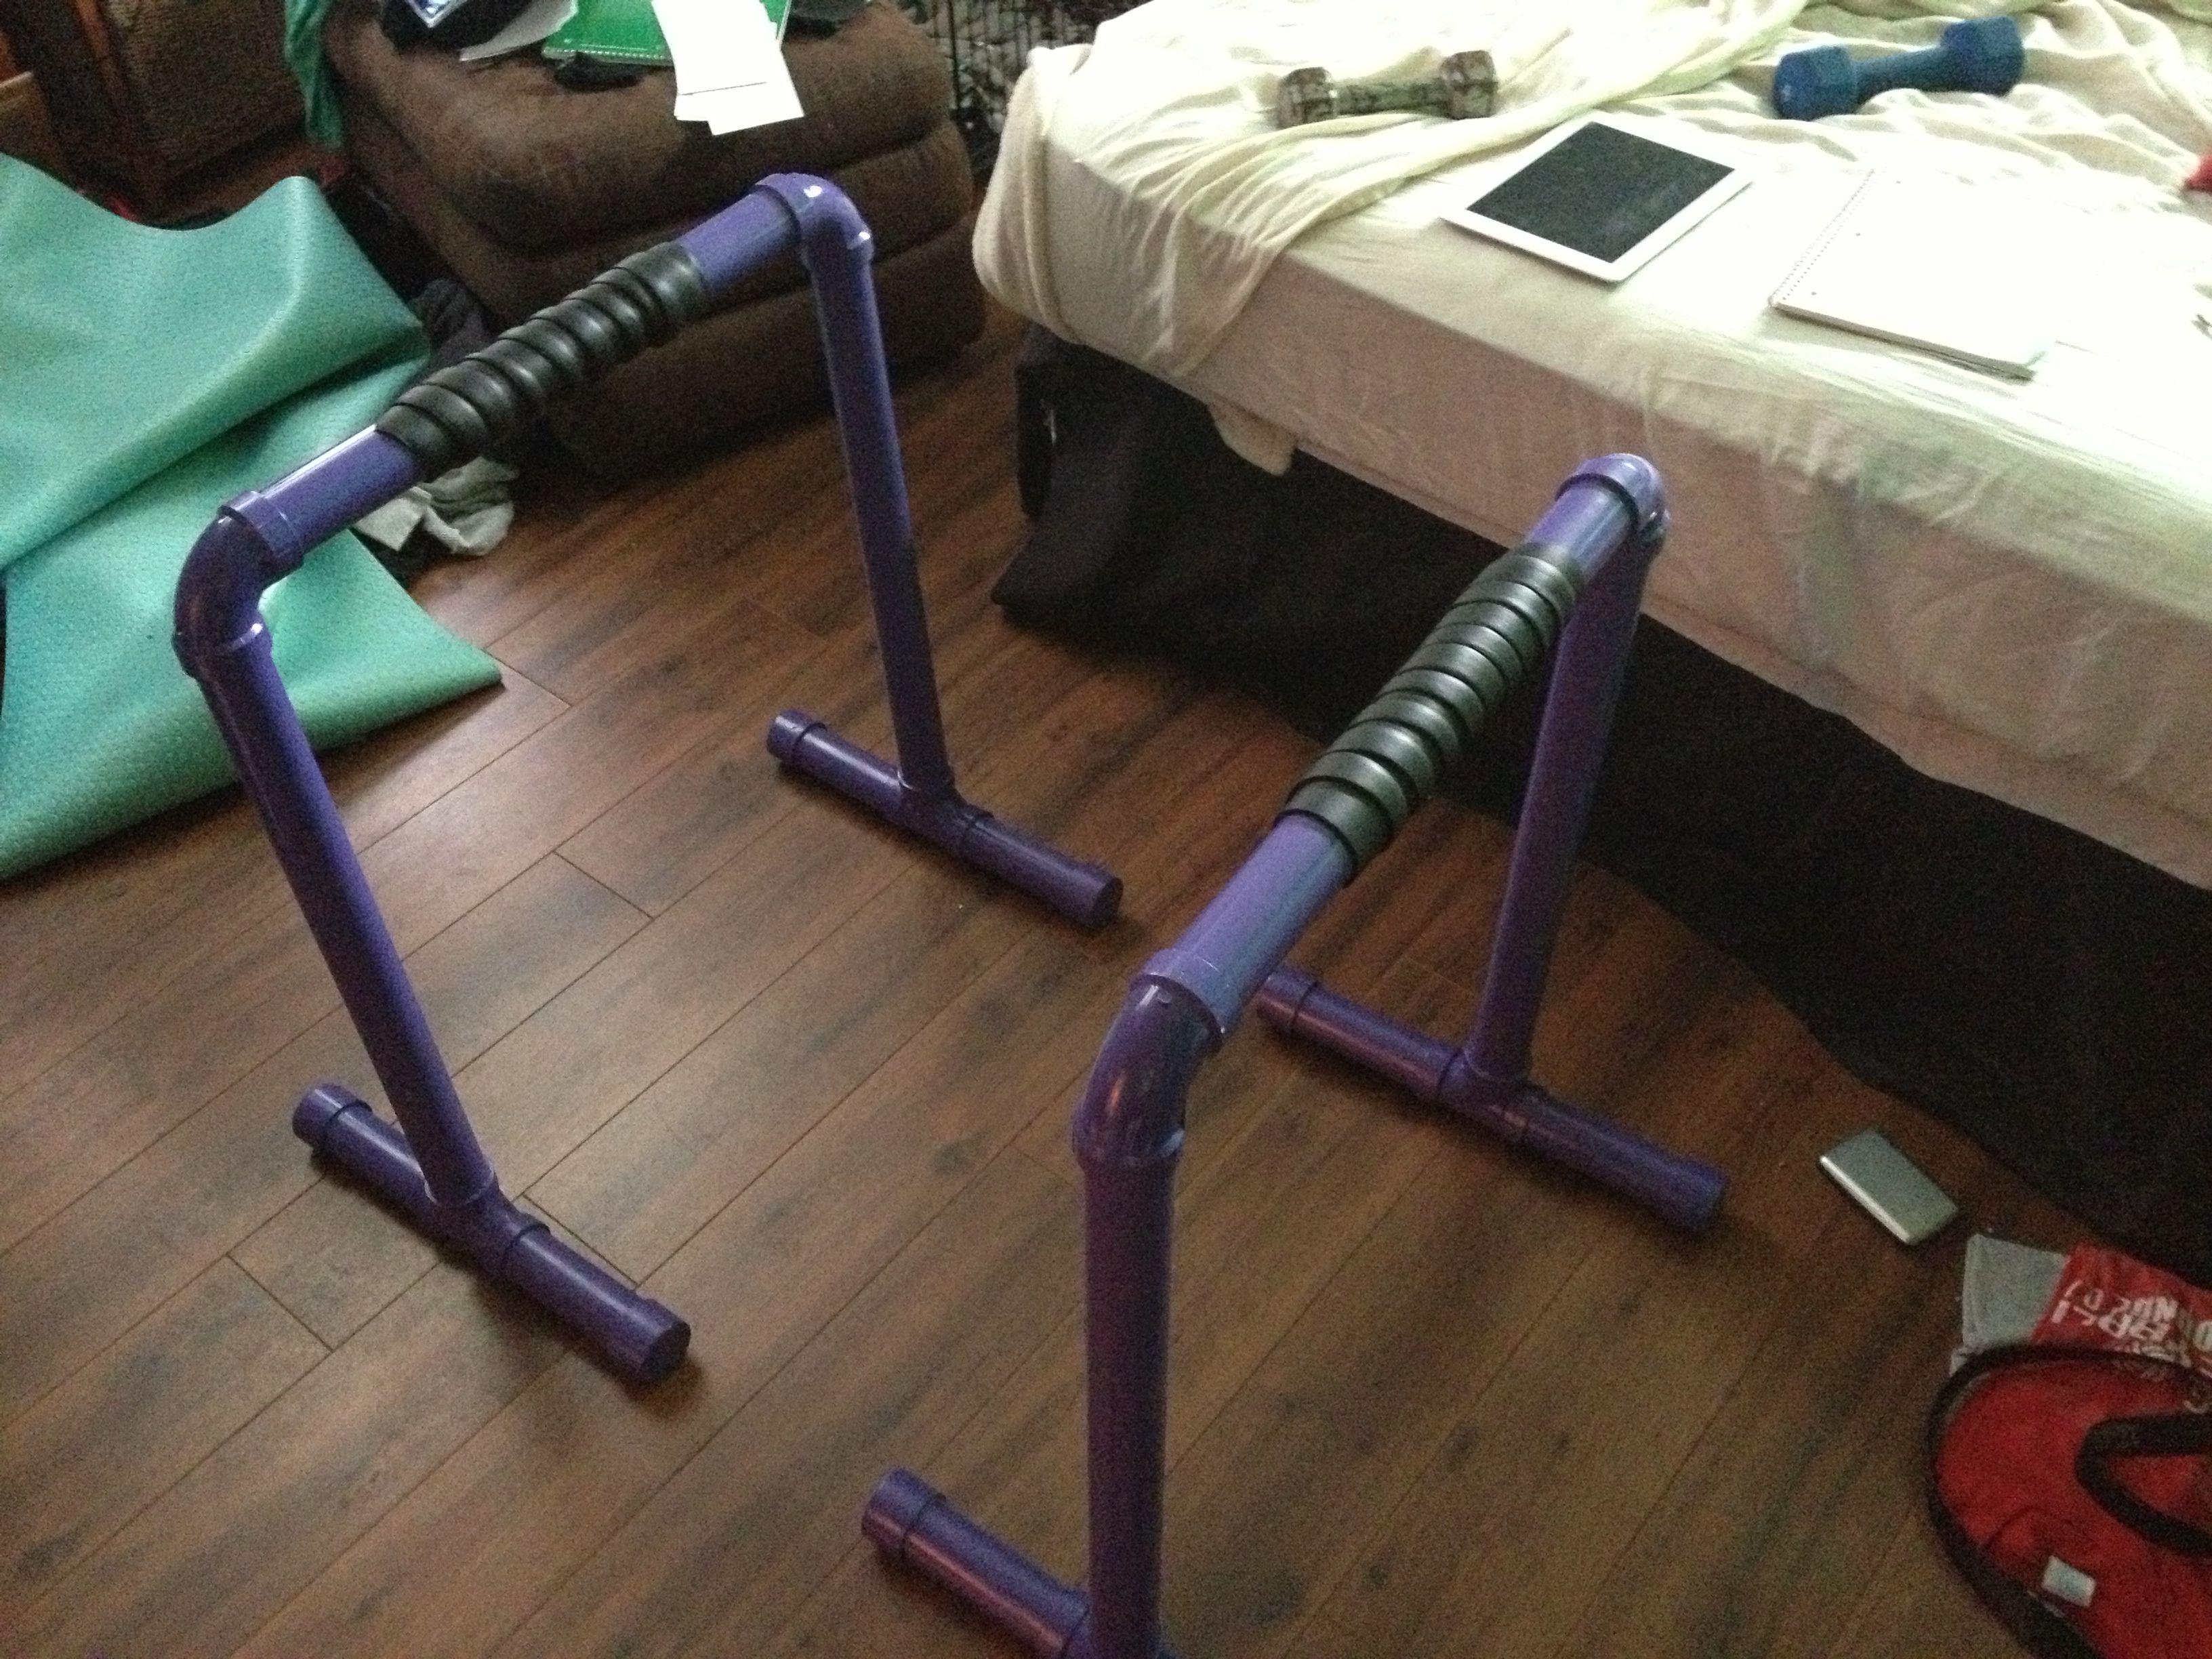 Diy Equalizers Bodyrock Dailyhiit Diy Home Gym Homemade Gym Equipment Diy Workout